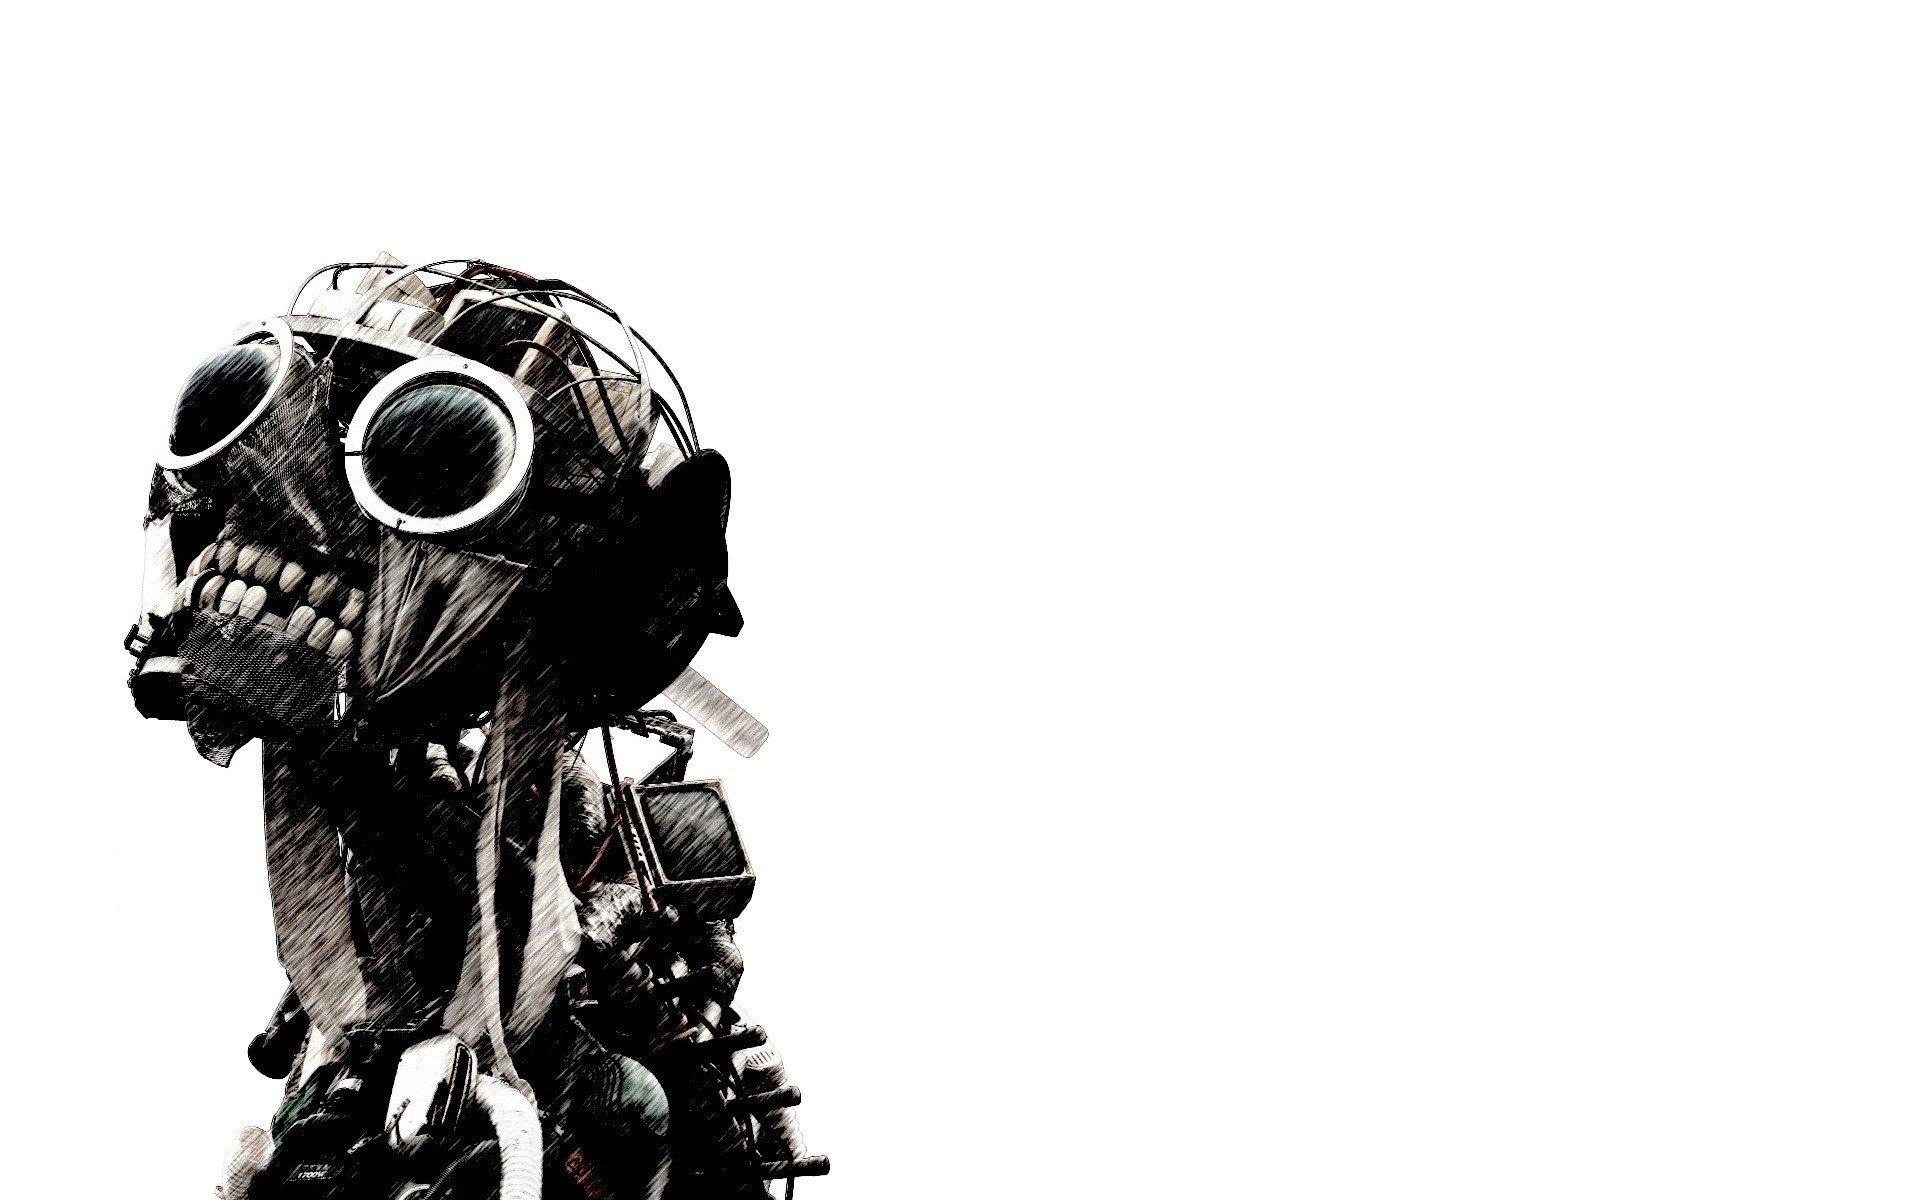 Sci Fi - Dark  Zombie Monster Mask Wallpaper